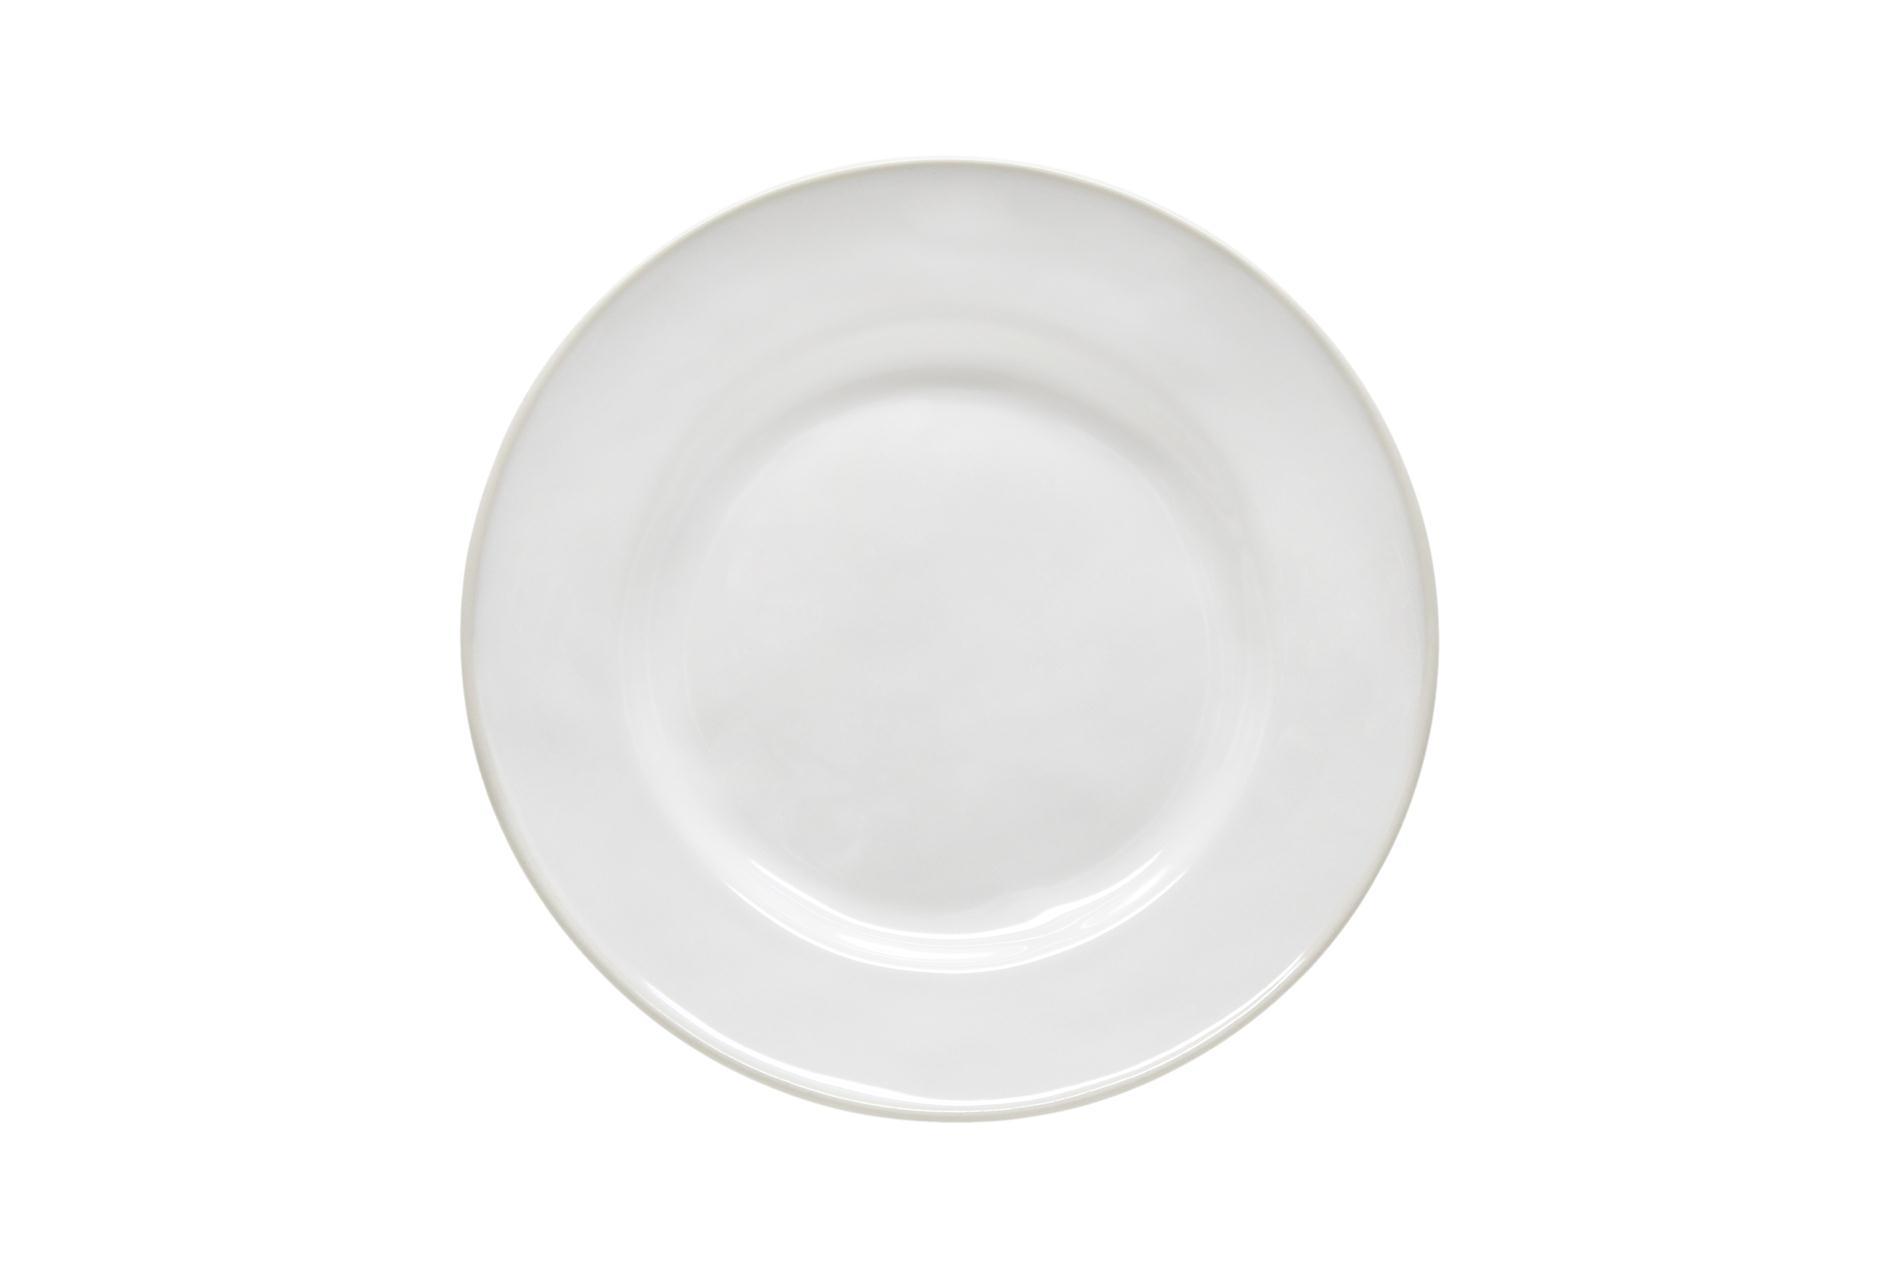 Kuchenteller / Dessertteller / Salatteller Astoria, weiß, 23 cm